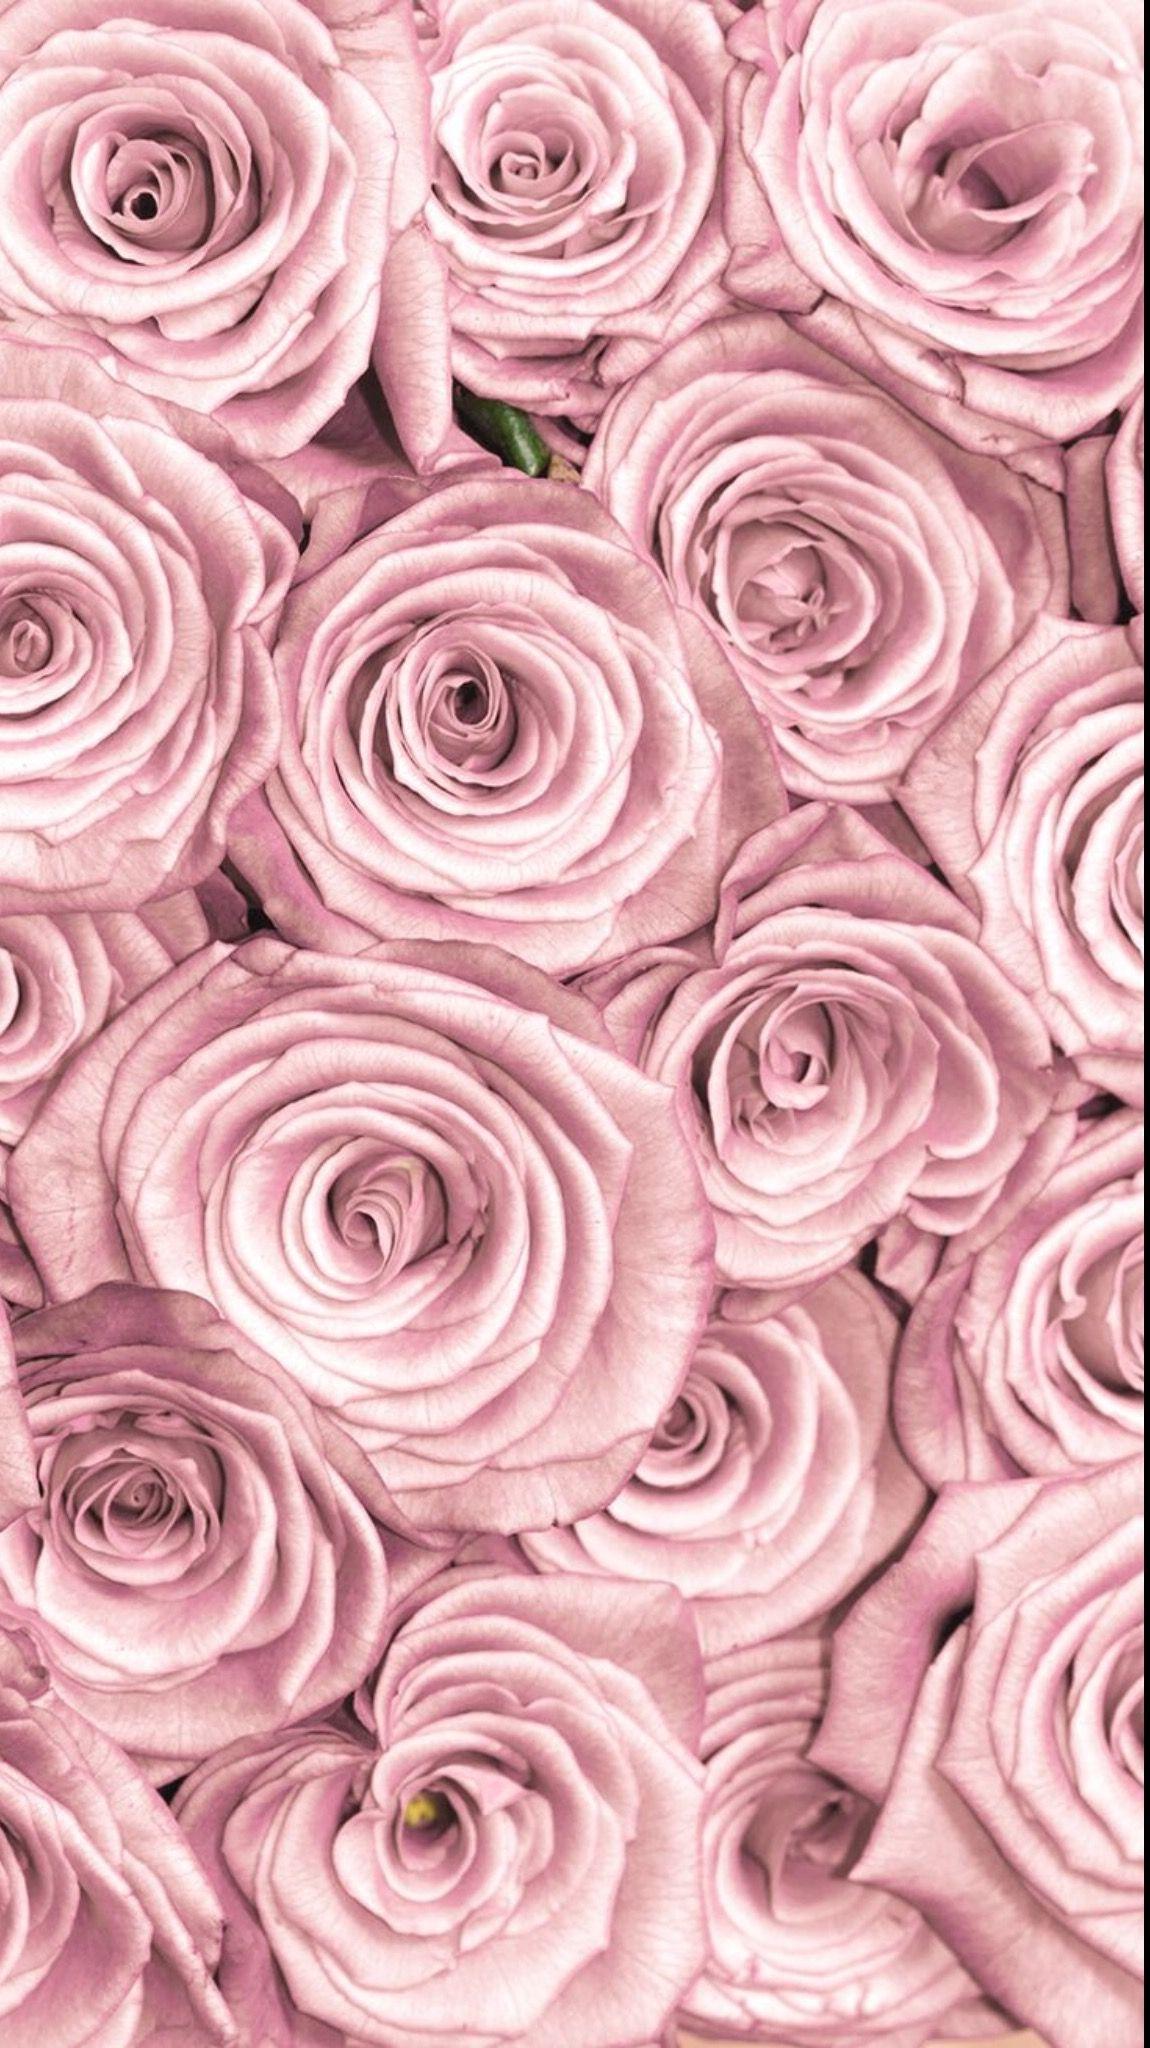 Flowers Lockscreen Rose Gold